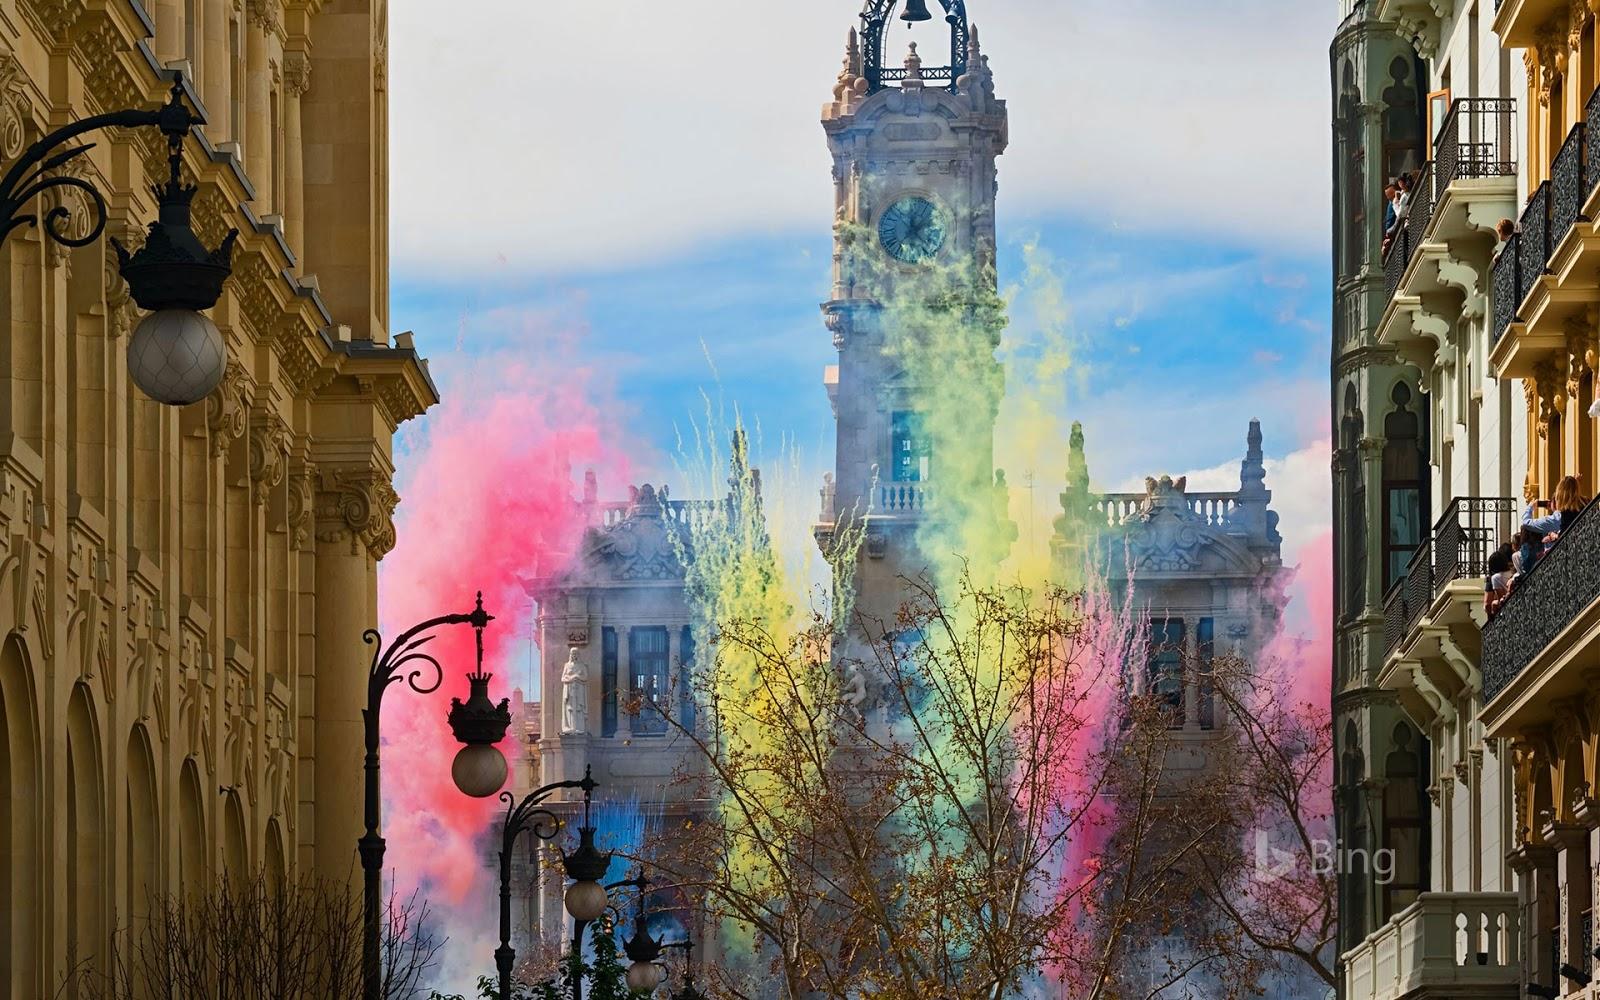 Fireworks at the Plaza del Ayuntamiento for las Fallas festival in Valencia, Spain © Helena G.H/Shutterstock